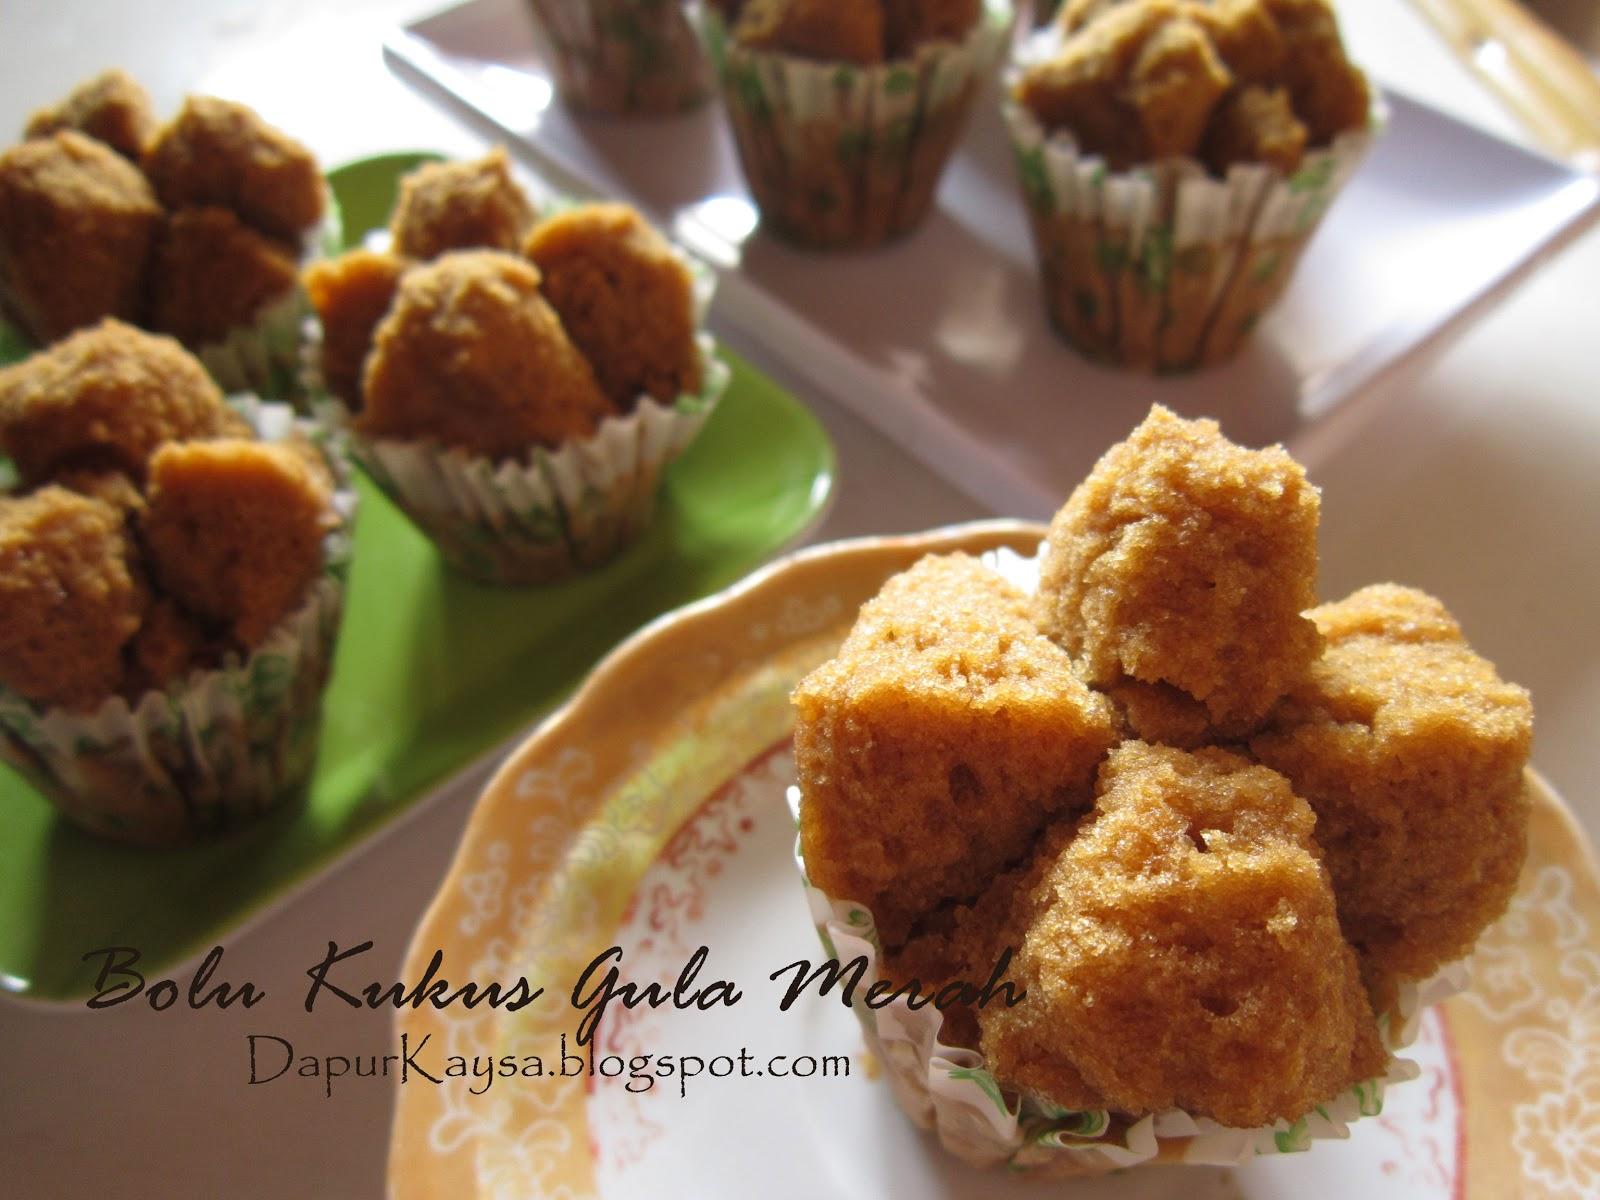 Resep Cake Coklat Kukus Ncc: Kaysa's Little Kitchen: Bolu Kukus Gula Merah